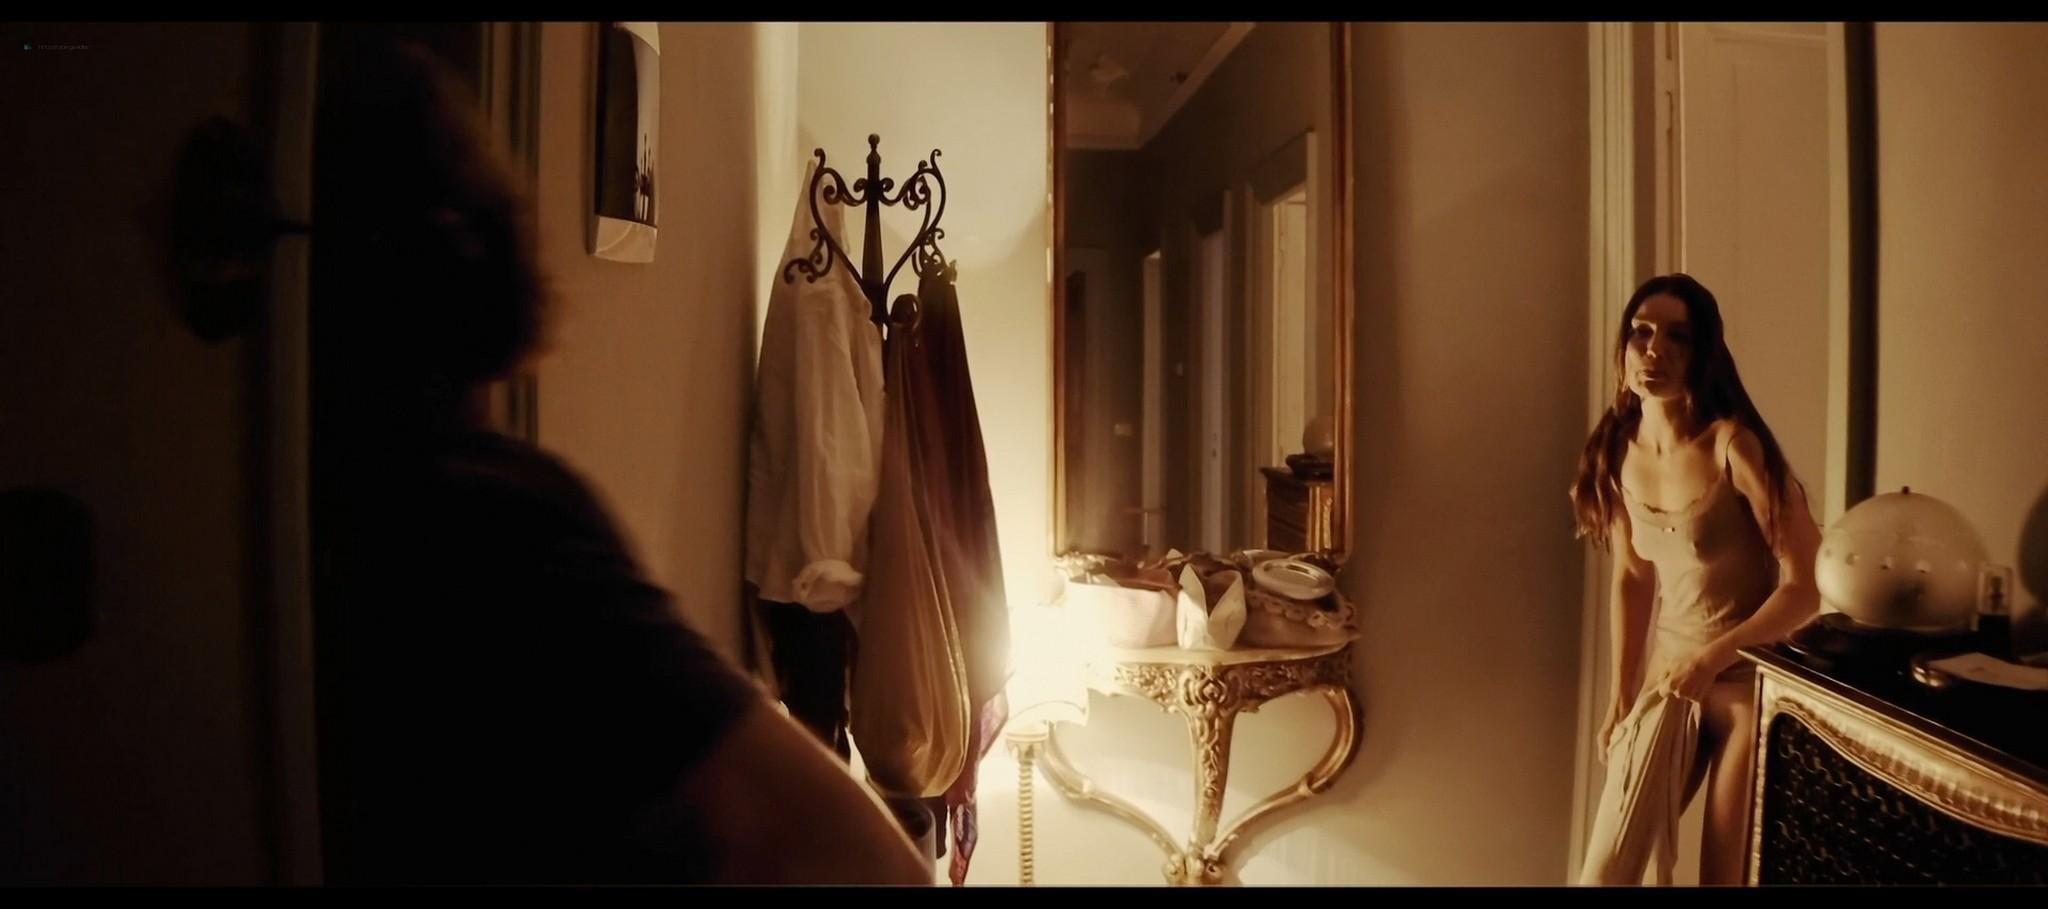 Cristina Chiriac nude full frontal Sofia Rania Dharma Mangia Woods full frontal too Tommaso 2019 HD 1080p Bluray 014